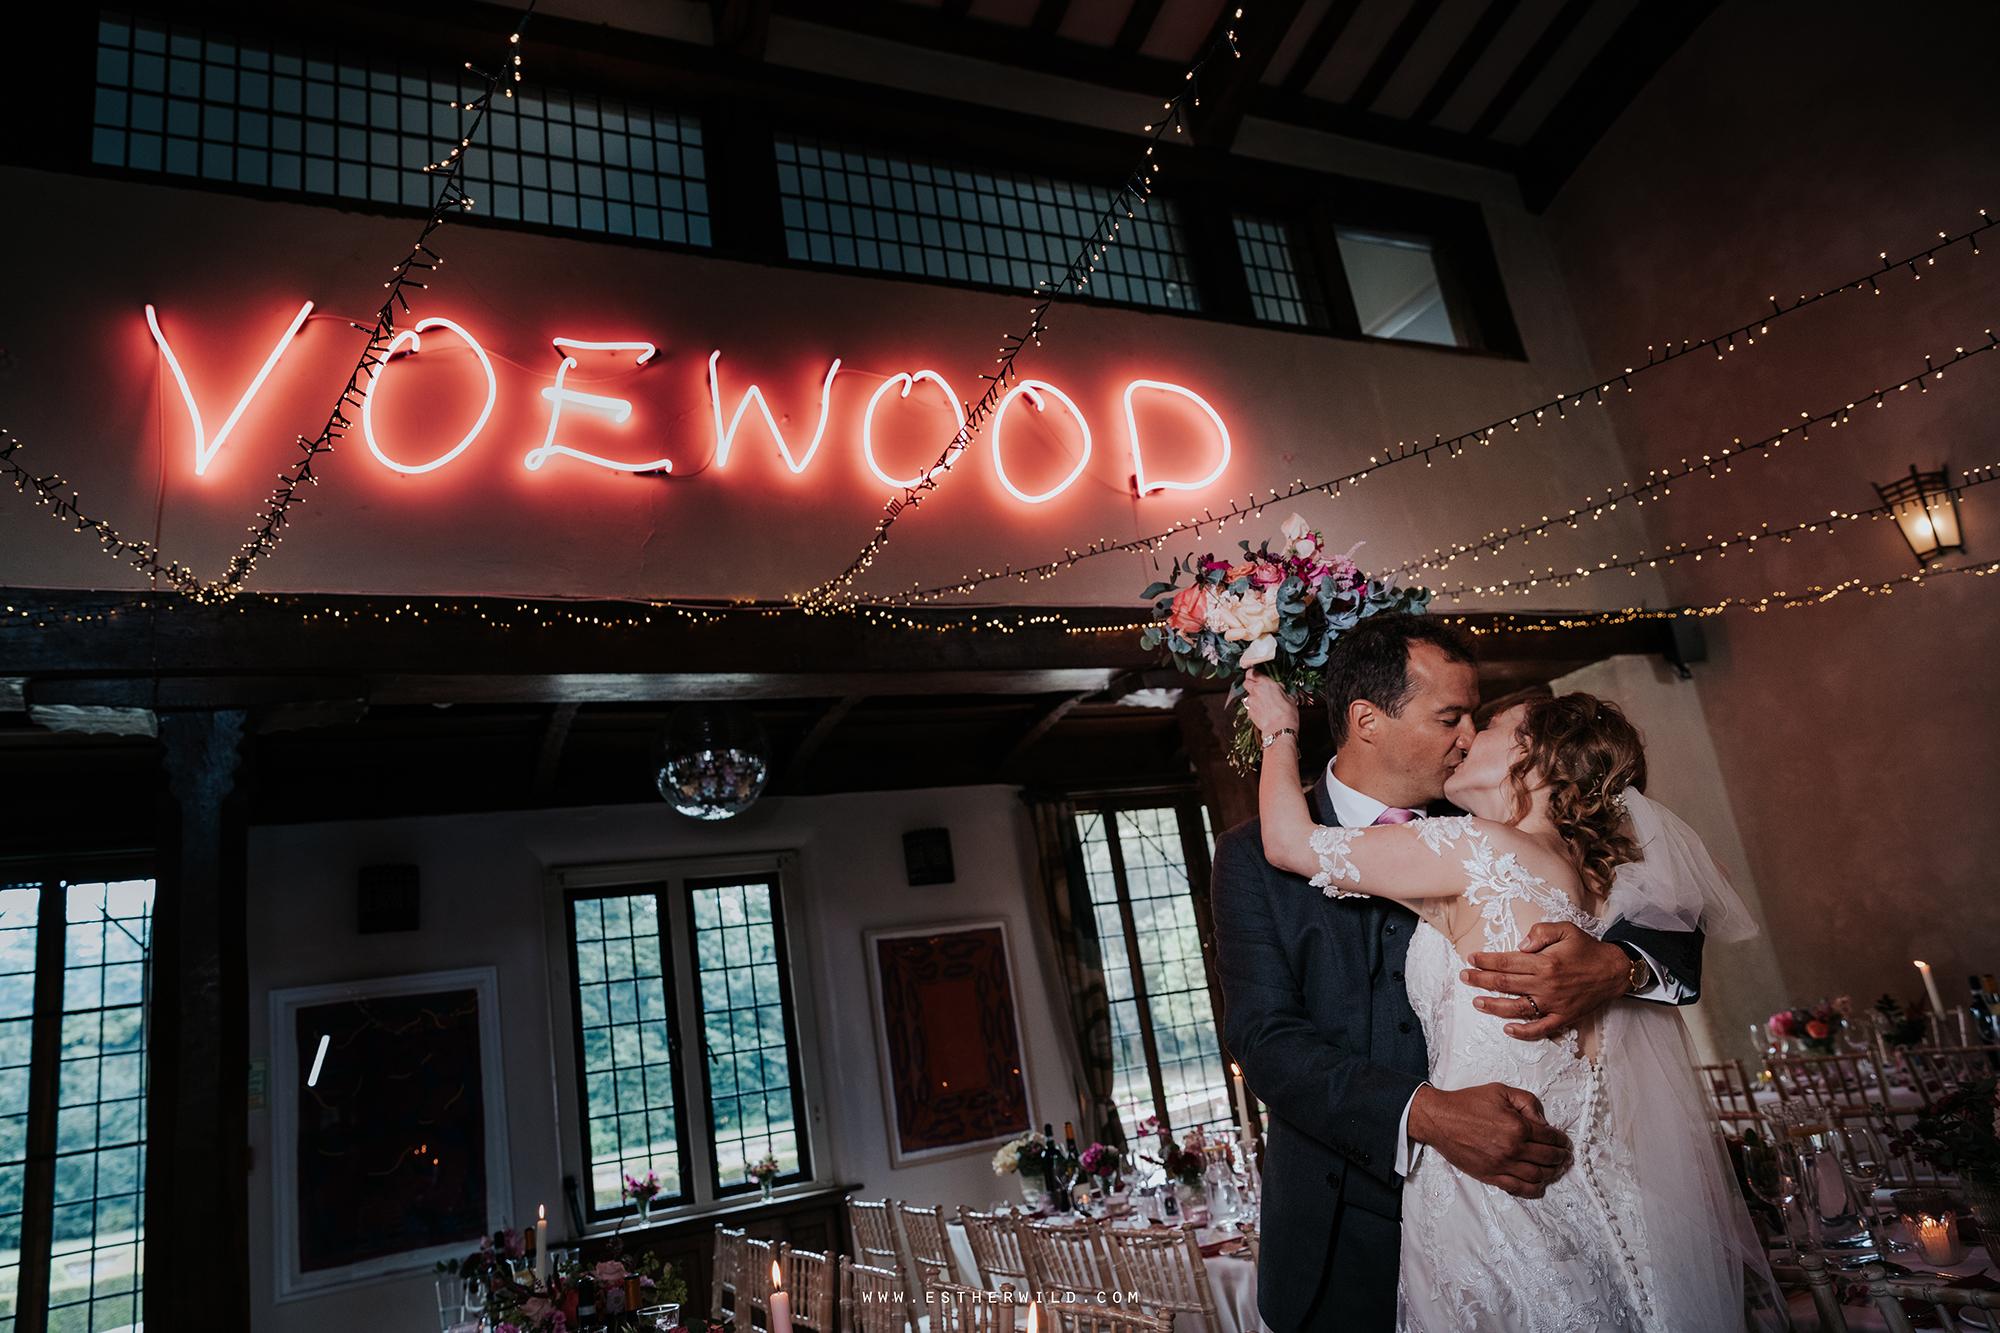 Voewood_Wedding_Norfolk_Photography_Esther_Wild_Photographer_IMG_2107.jpg